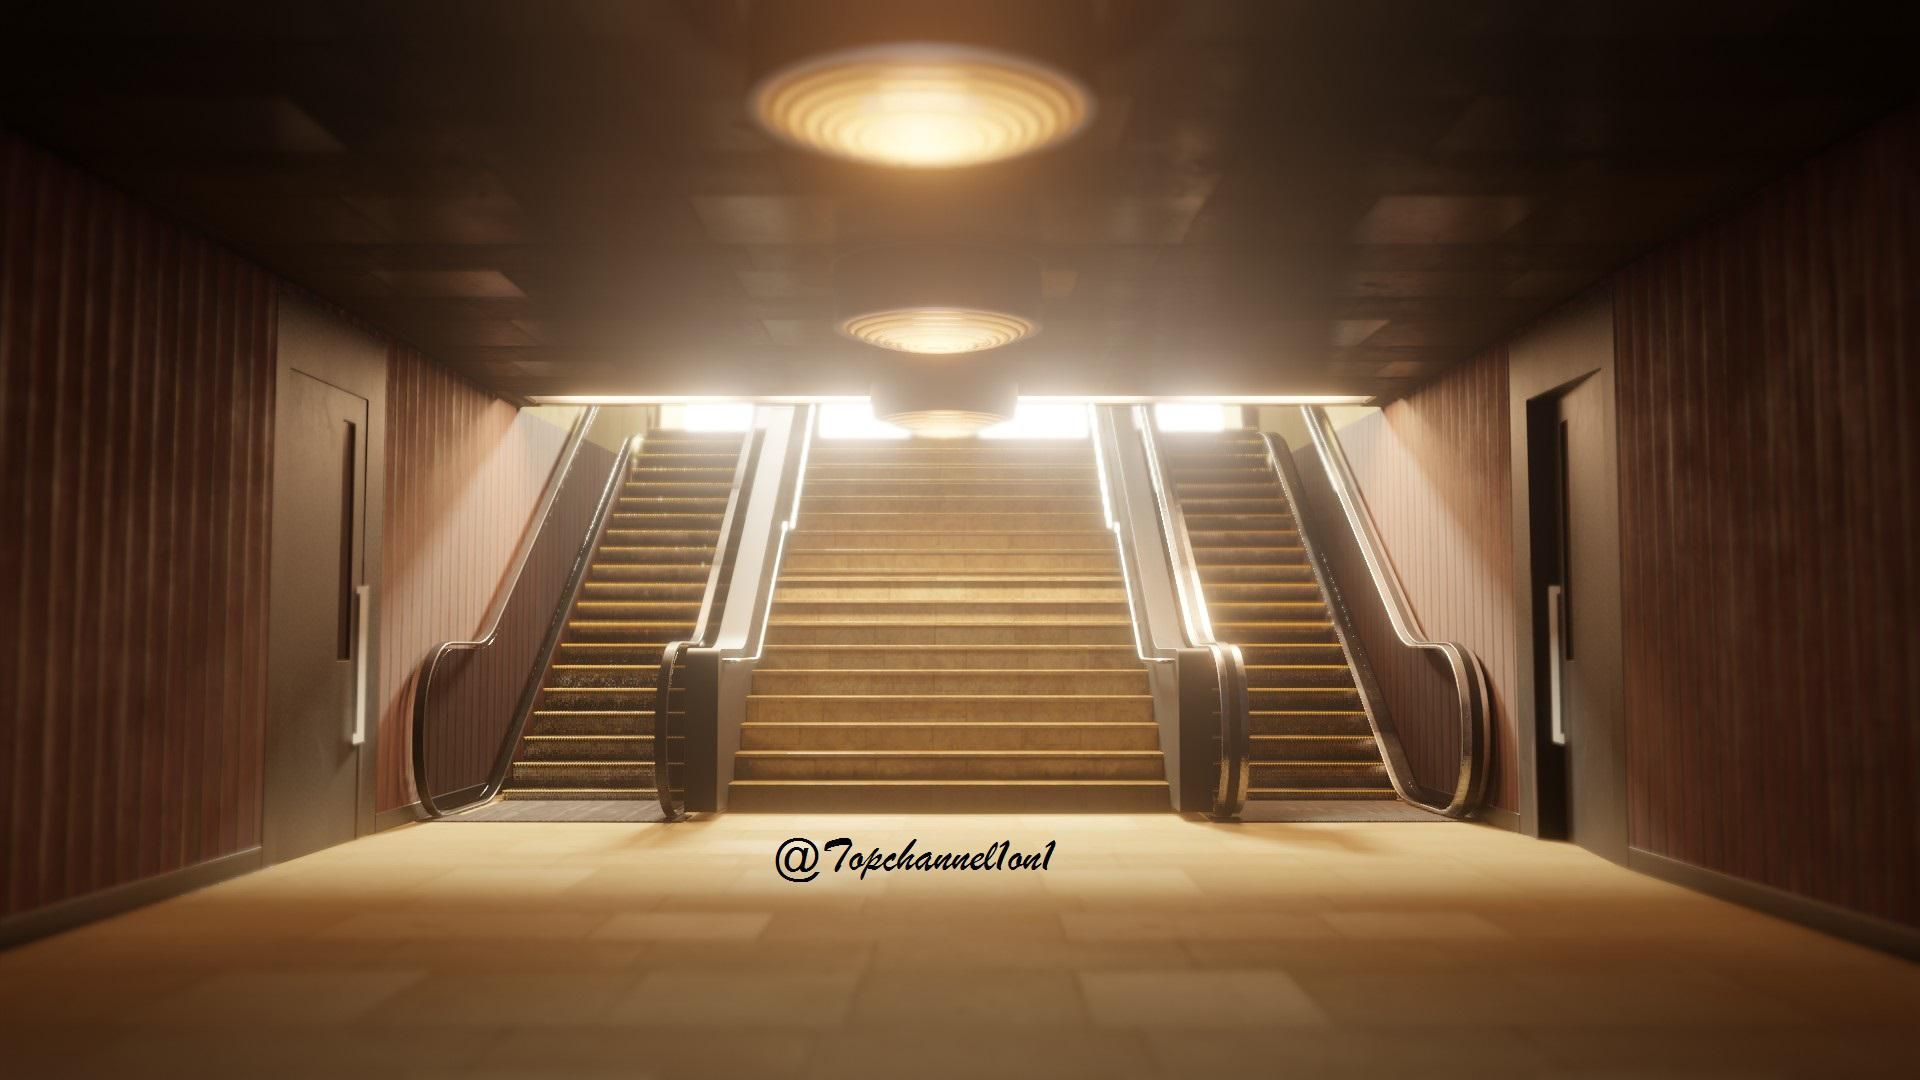 subway entrance textured and lighting blender eevee in